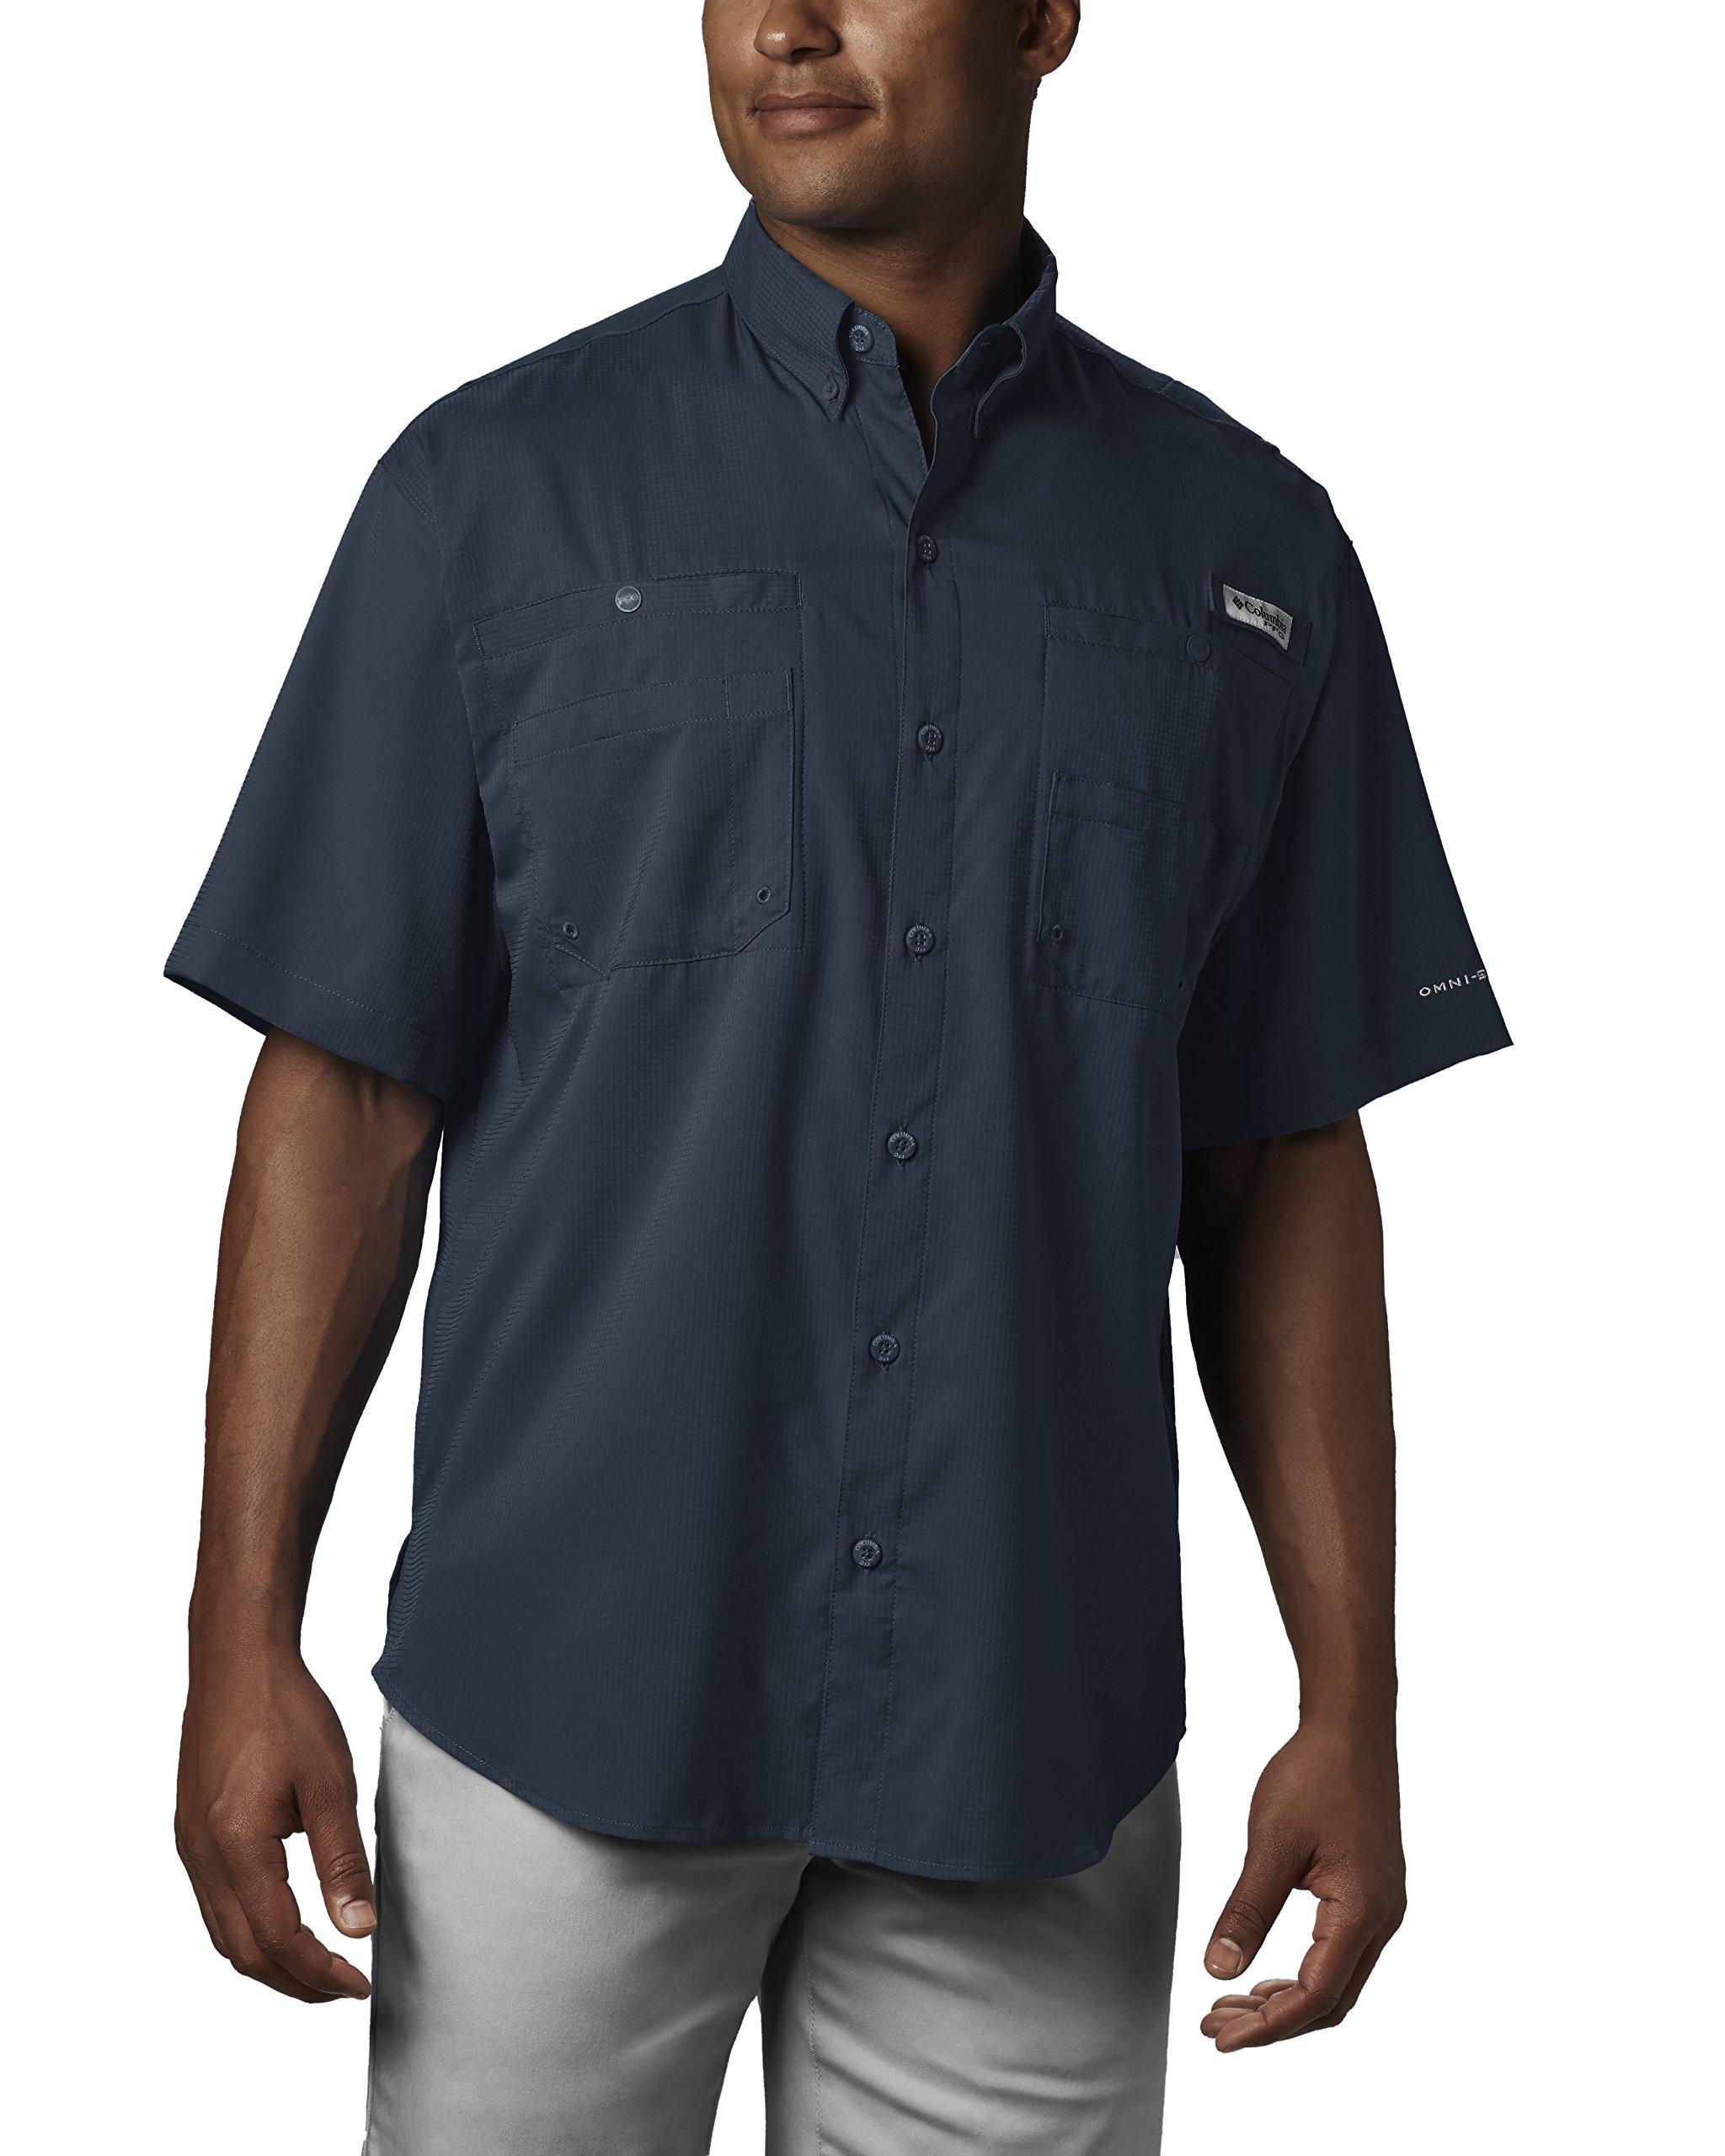 Columbia Men's Tamiami II Short Sleeve Fishing Shirt, Collegiate Navy, X-Small